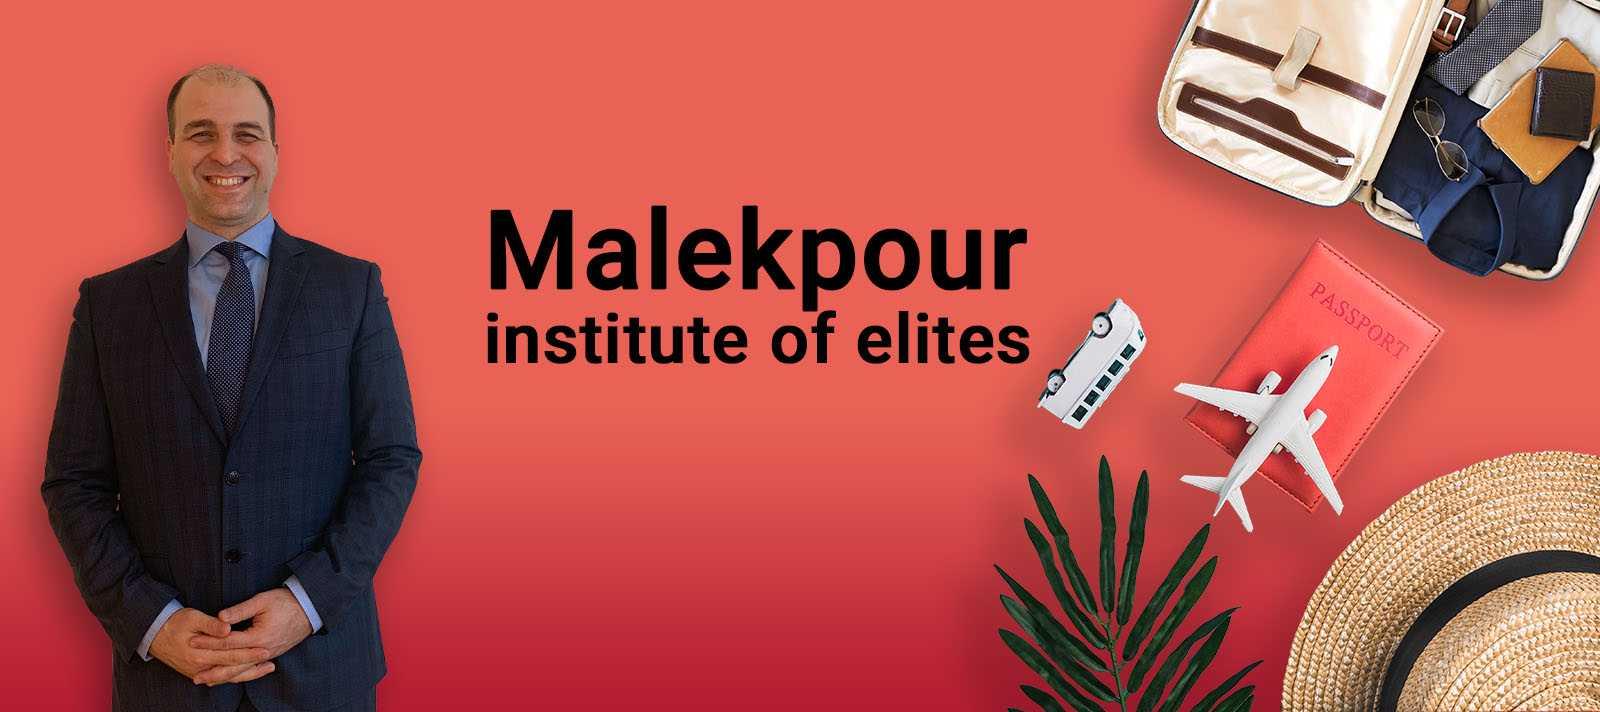 malekpourmie banner EN version edited Malekpour institute of elites   MIE